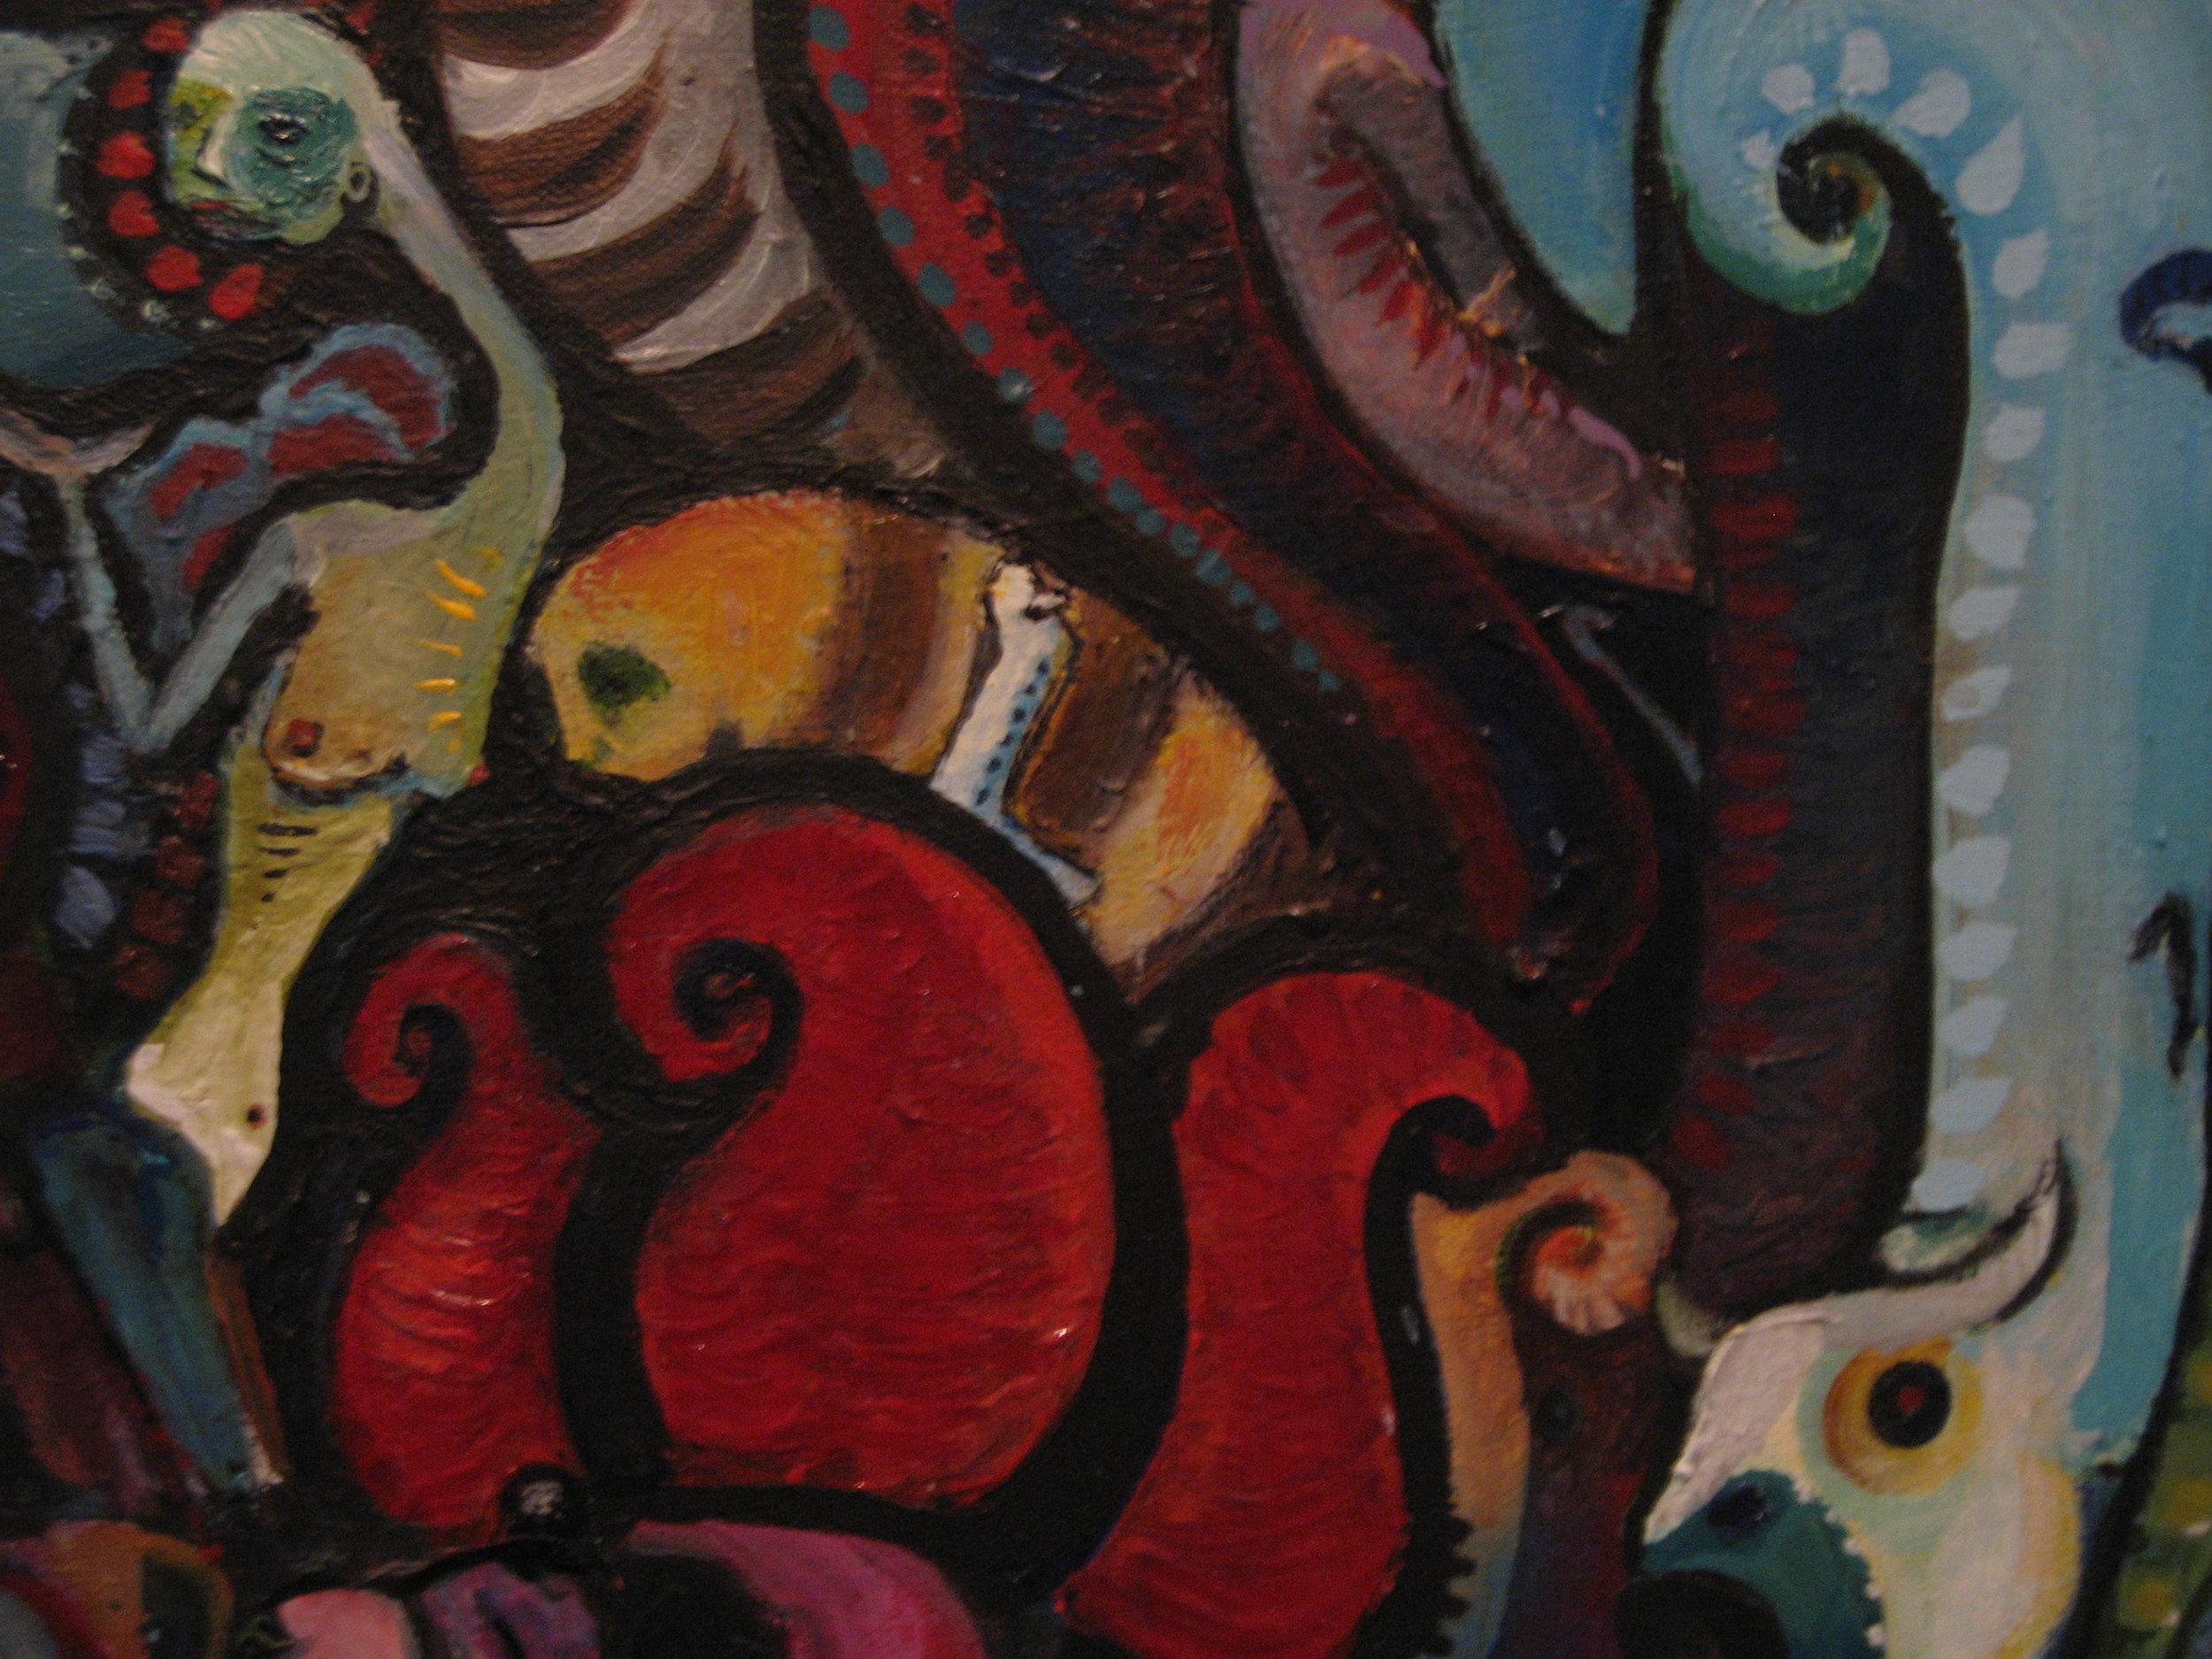 surreal-painting-by-jason-borders.jpg